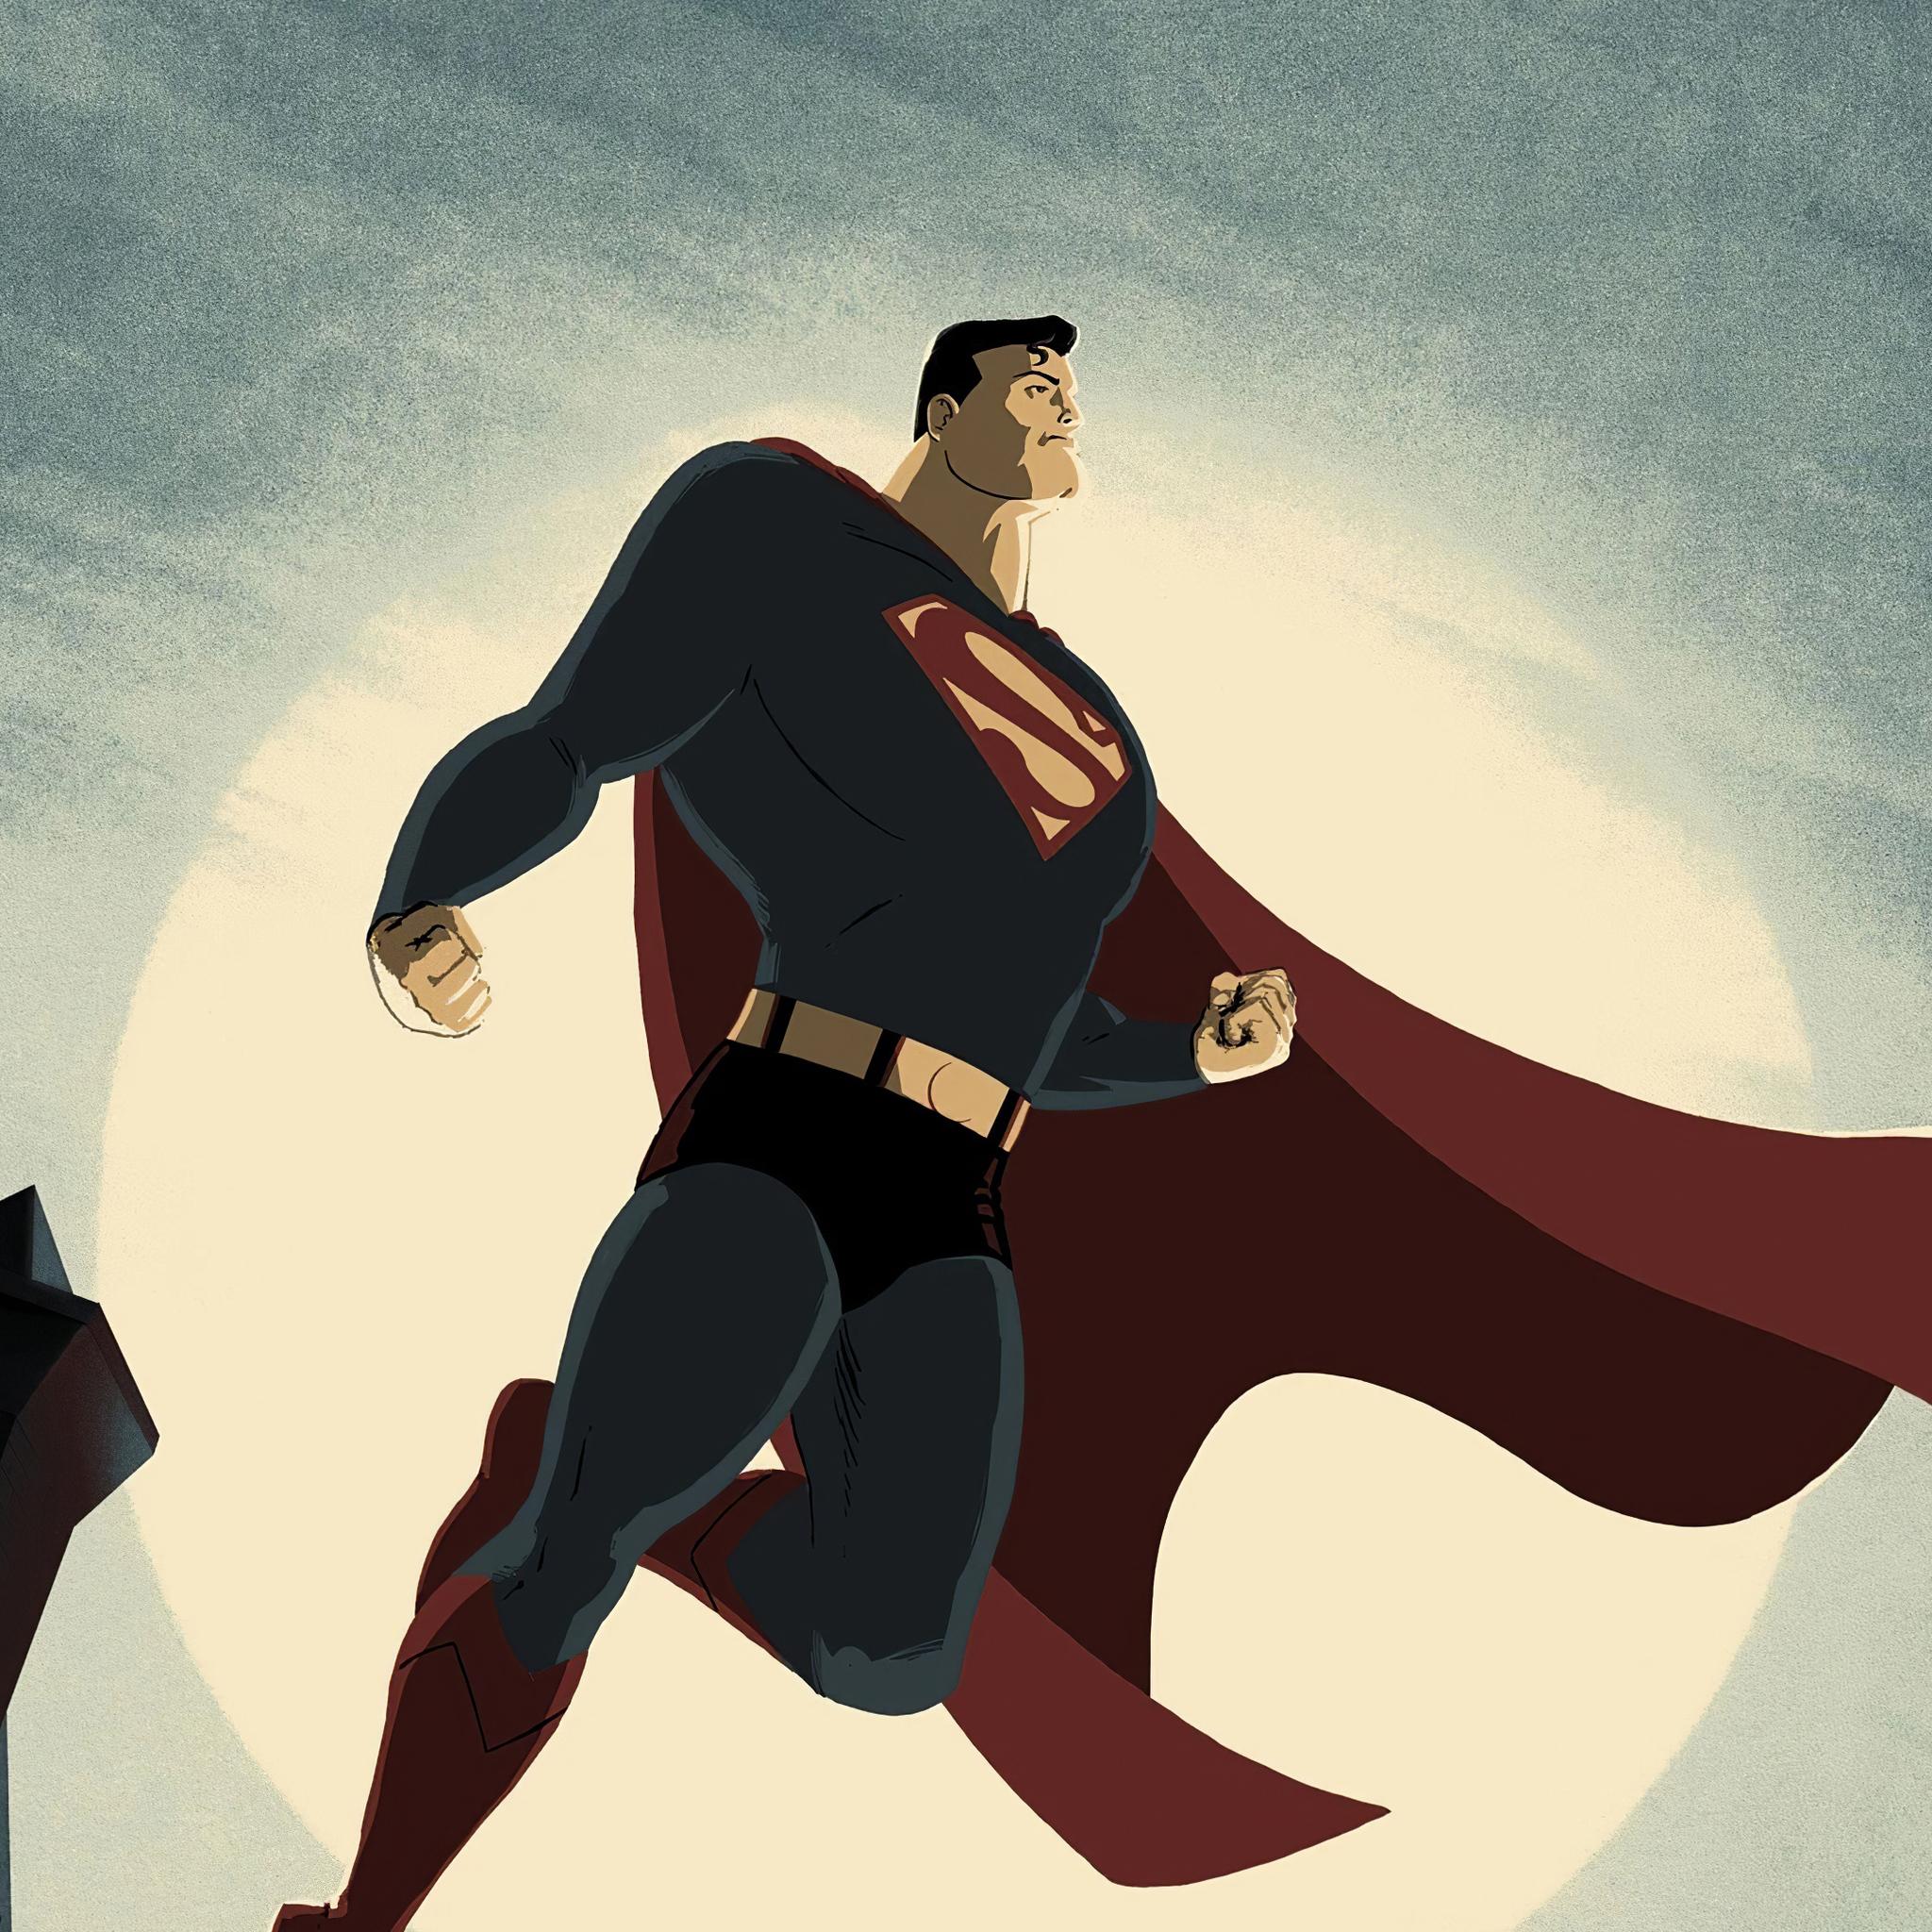 superman-up-4k-yq.jpg